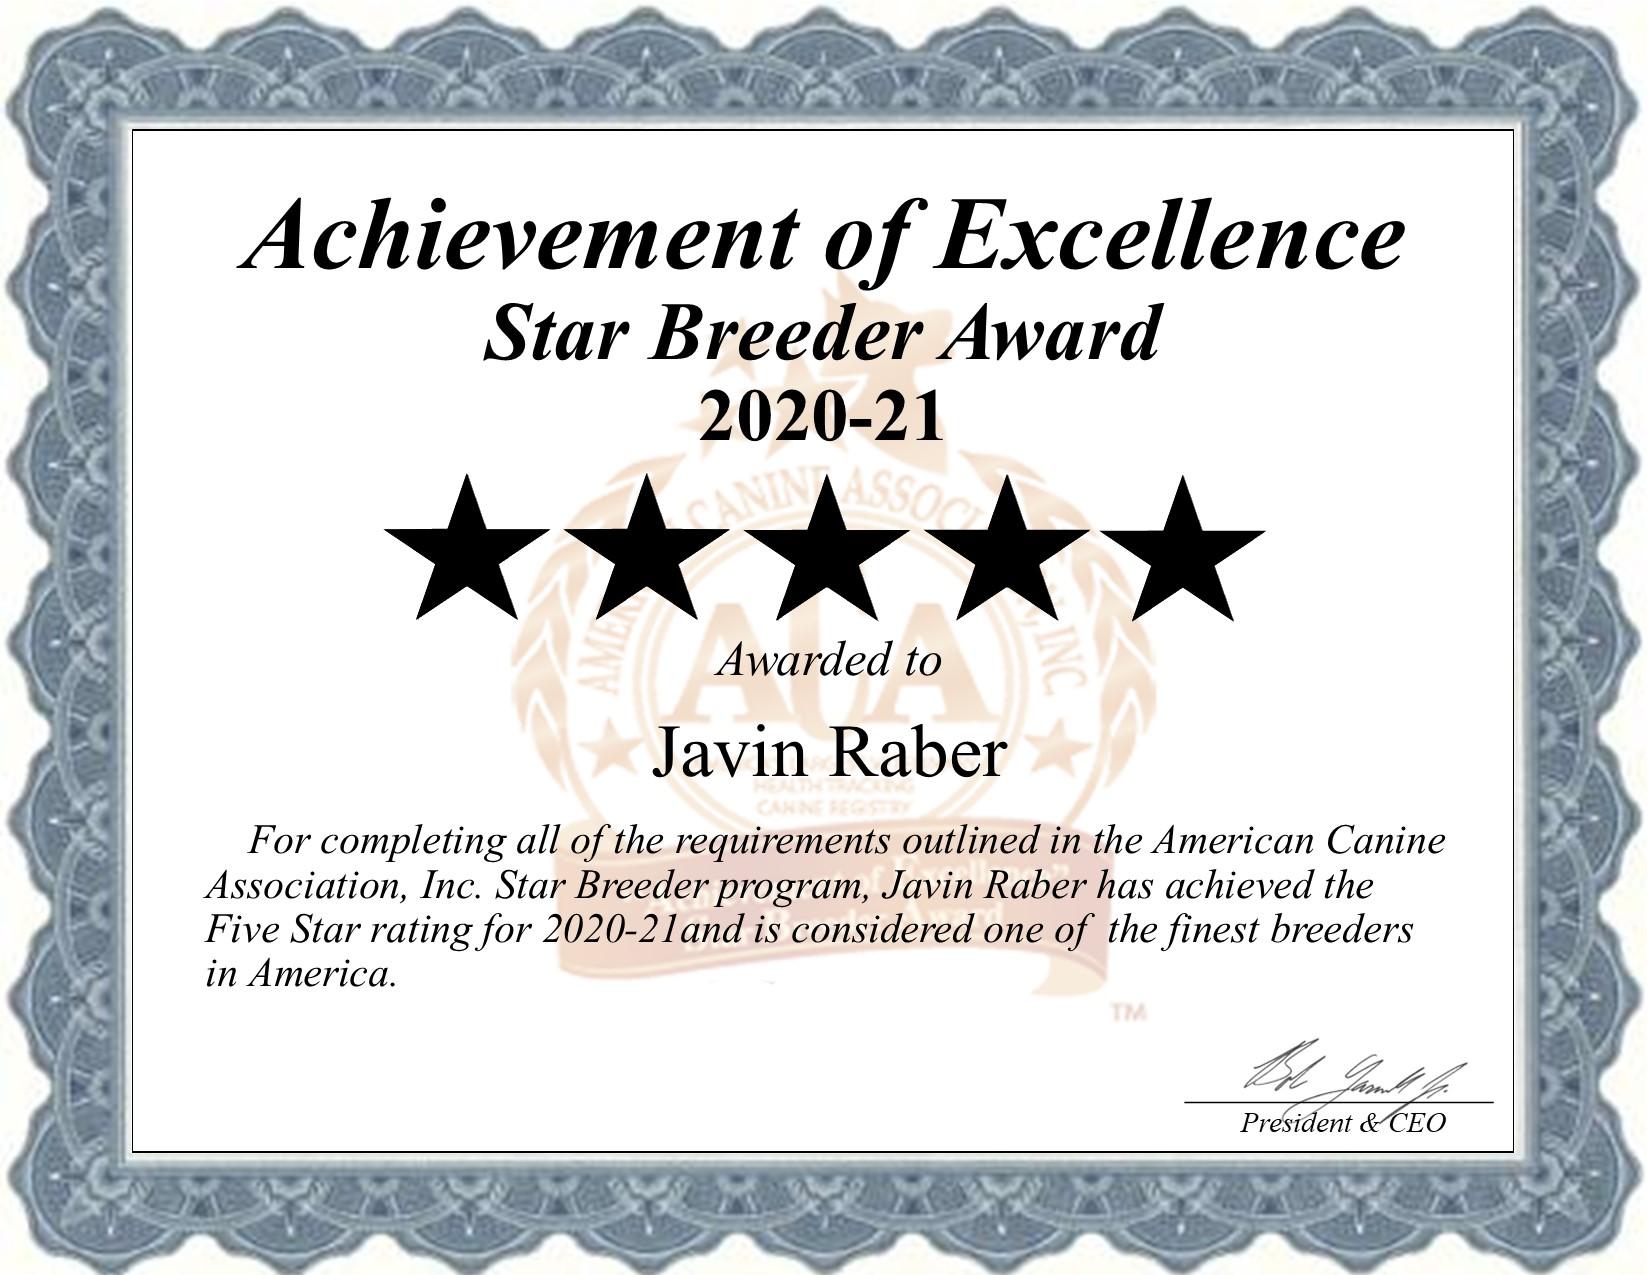 Javin, Raber, dog, breeder, star, certificate, Javin-Raber, Flat Rock, Il, Illinios, puppy, dog, kennels, mill, puppymill, usda, 5-star, aca, ica, registered, Berniedoodle, 33-A-0586